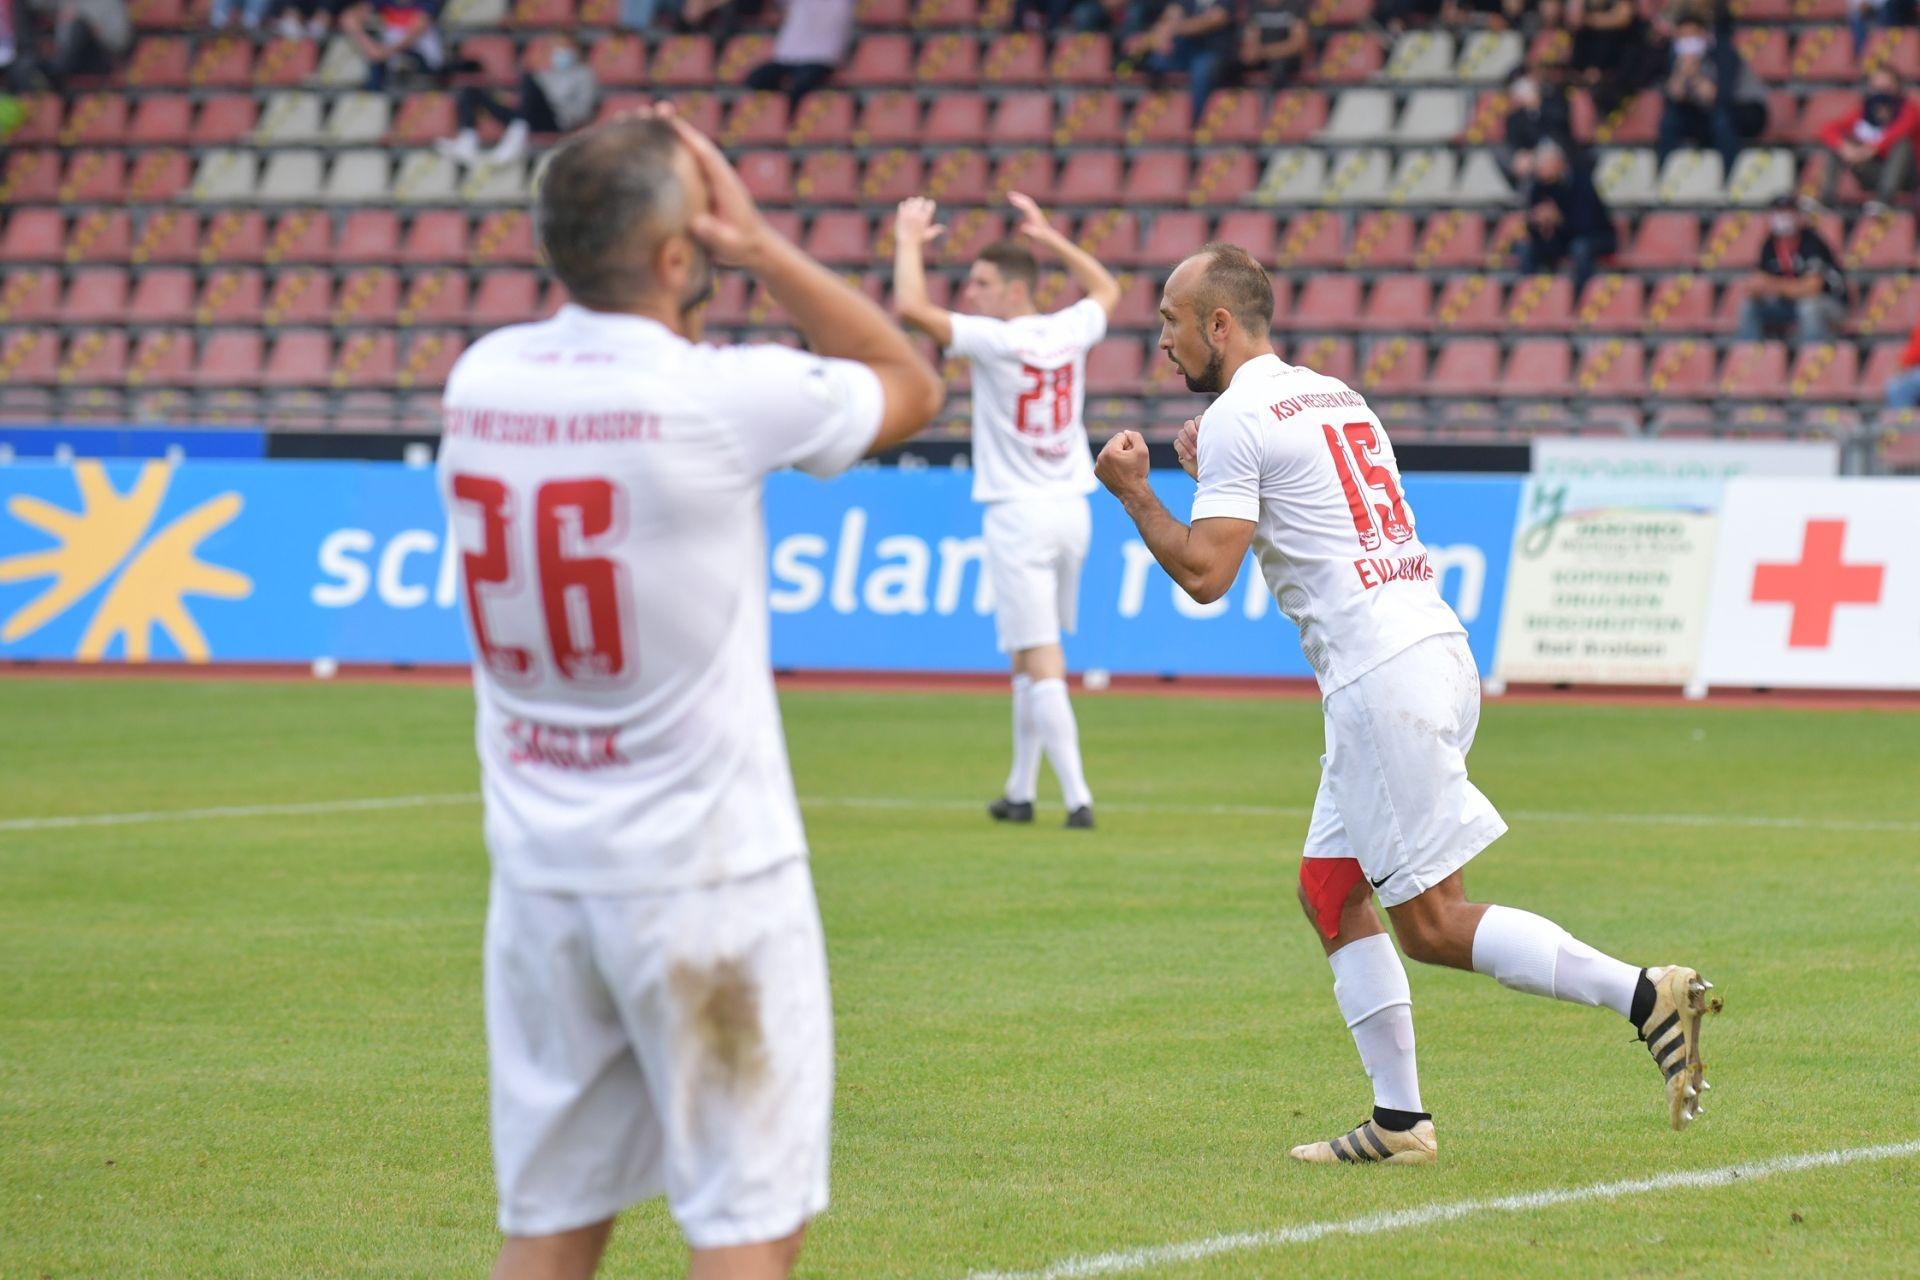 Regionalliga Südwest 2020/21, KSV Hessen Kassel, Rot-Weiss-Koblenz, Endstand 1:1, Saglik, Evljuskin, Iksal